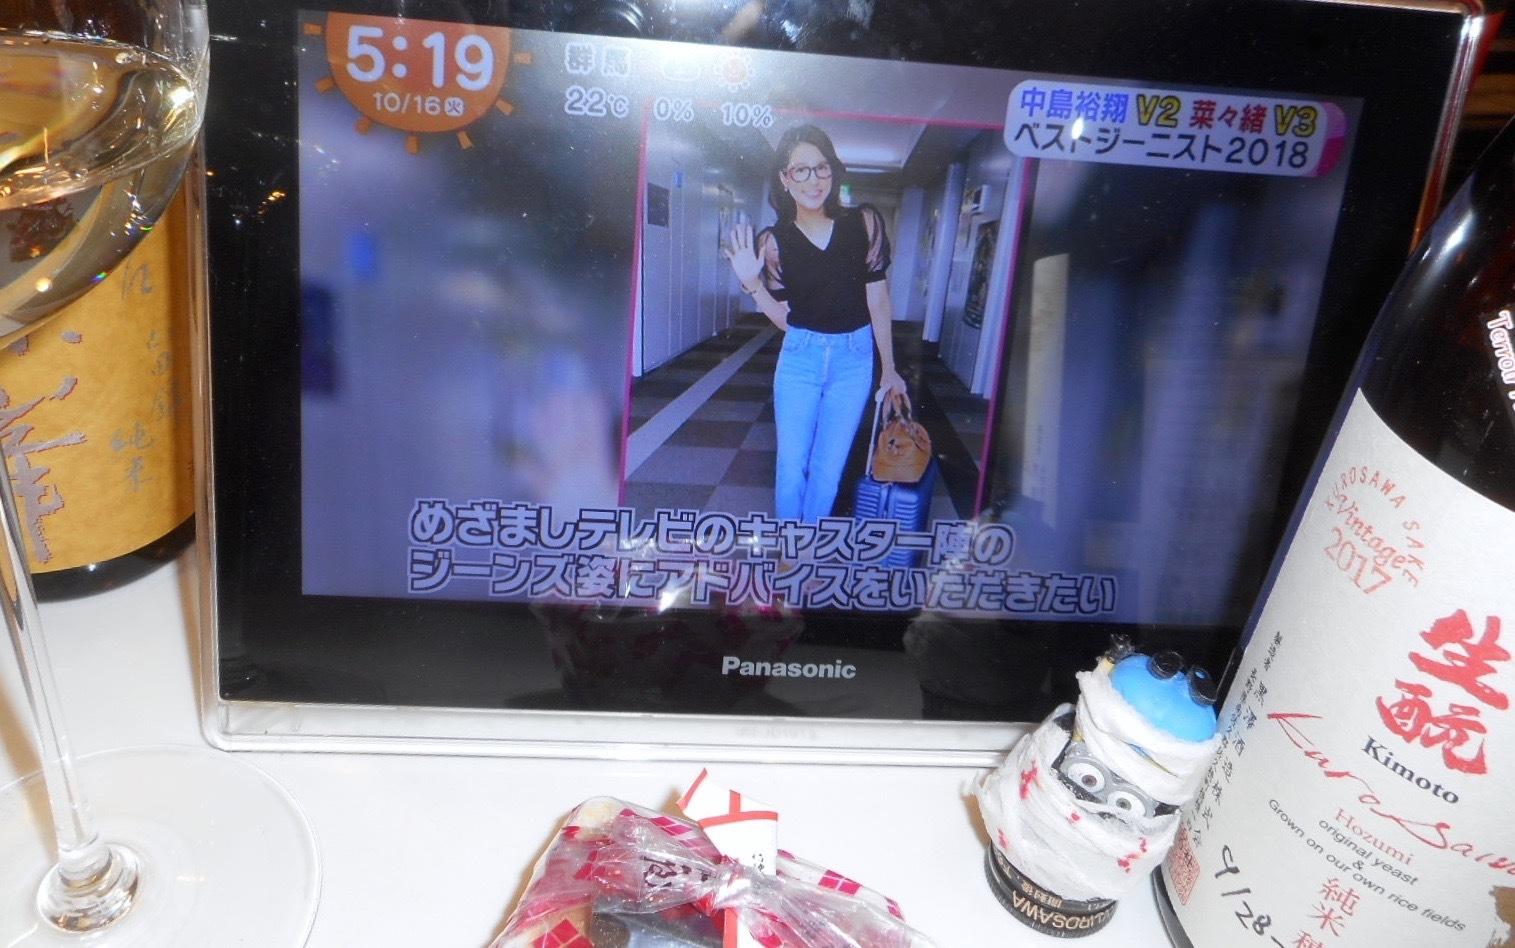 kurosawa_hodumi_akiakagari29by3.jpg